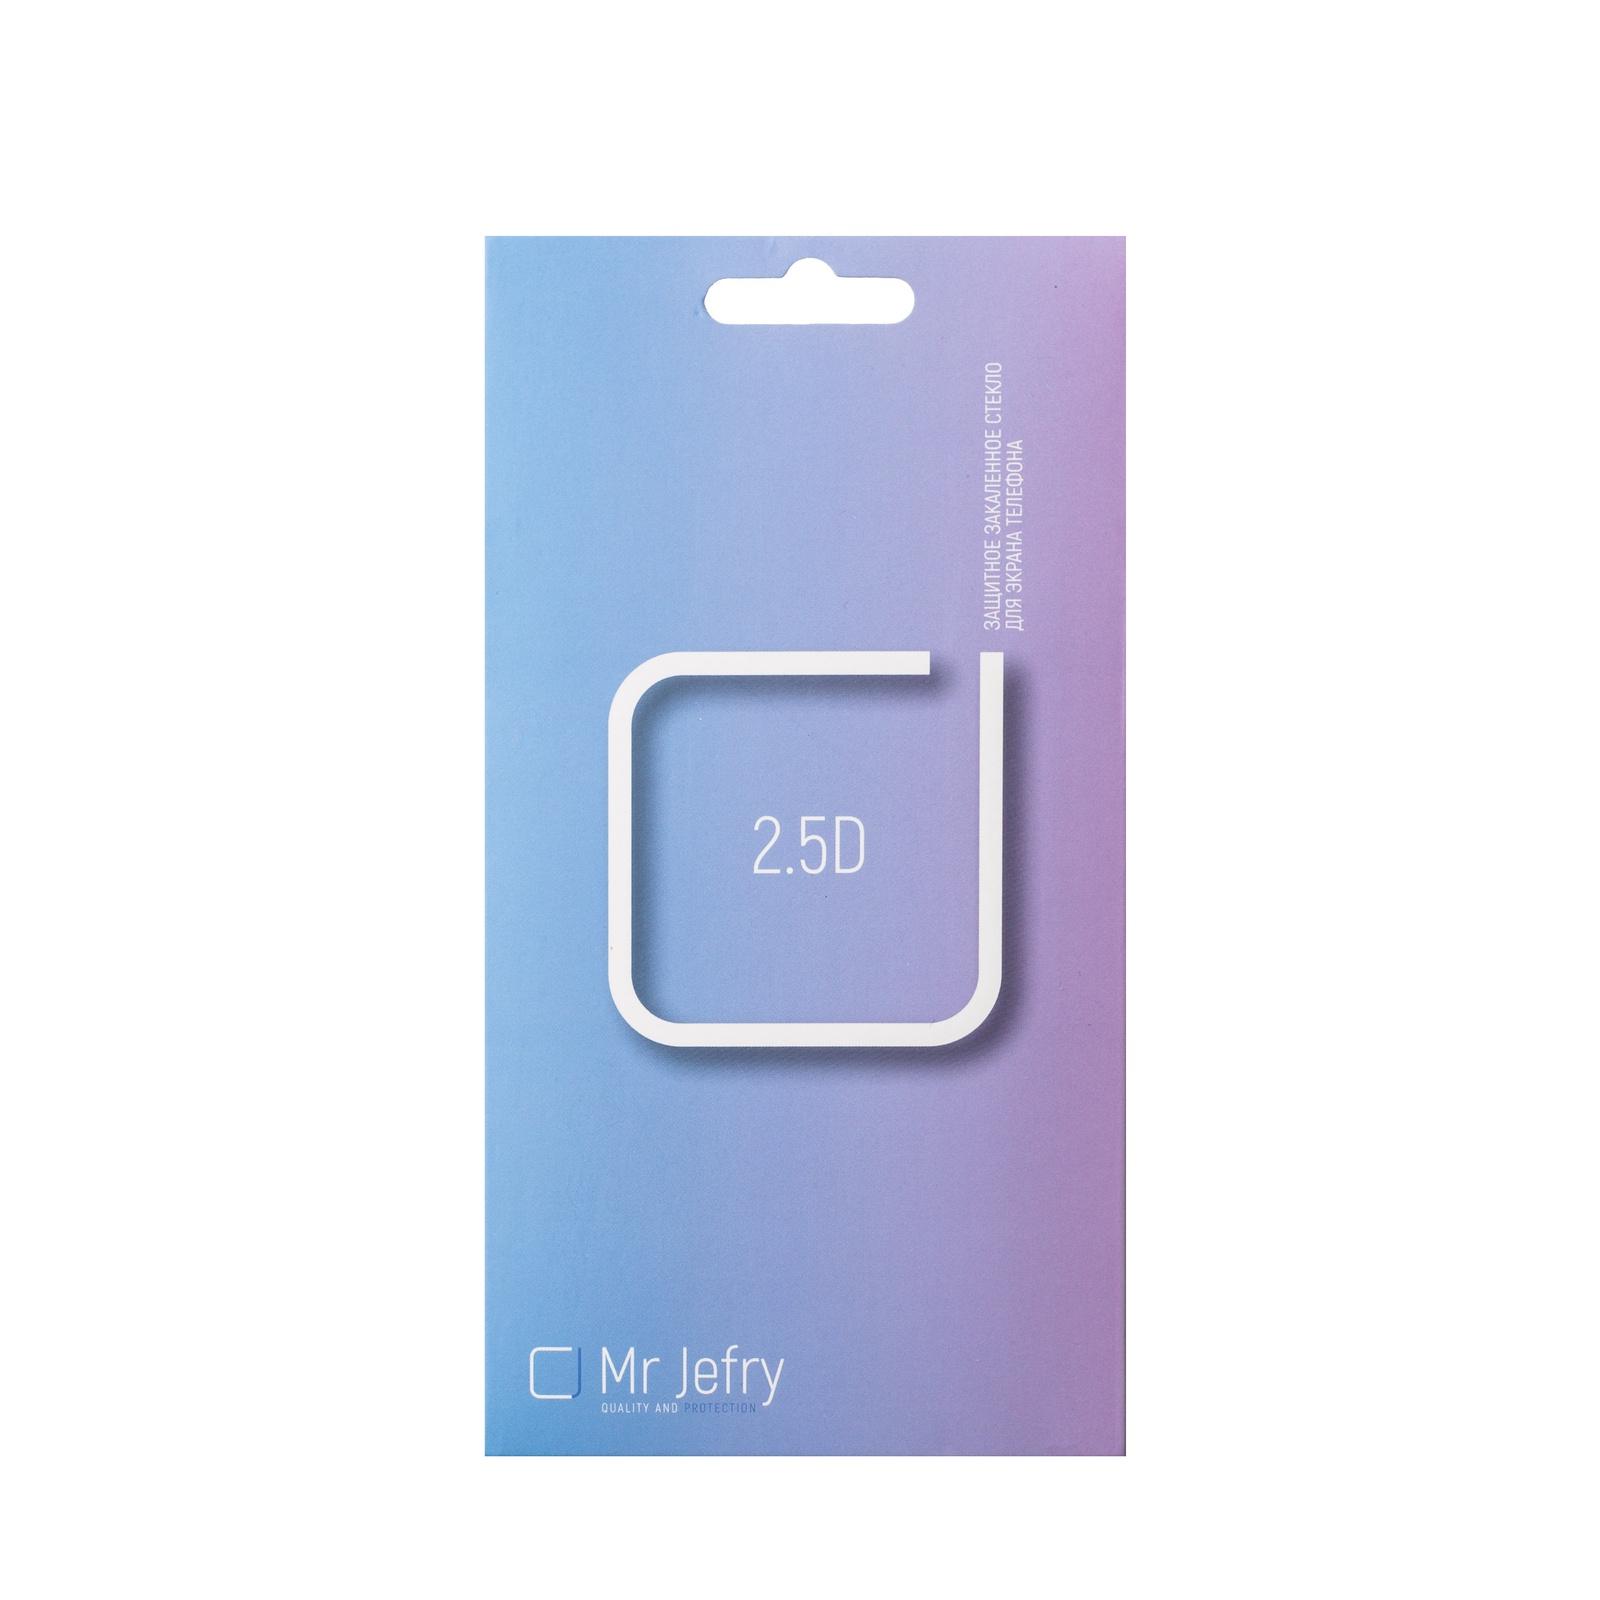 Mr Jefry стекло защитное (многослойное) 2,5D для Huawei Honor 9